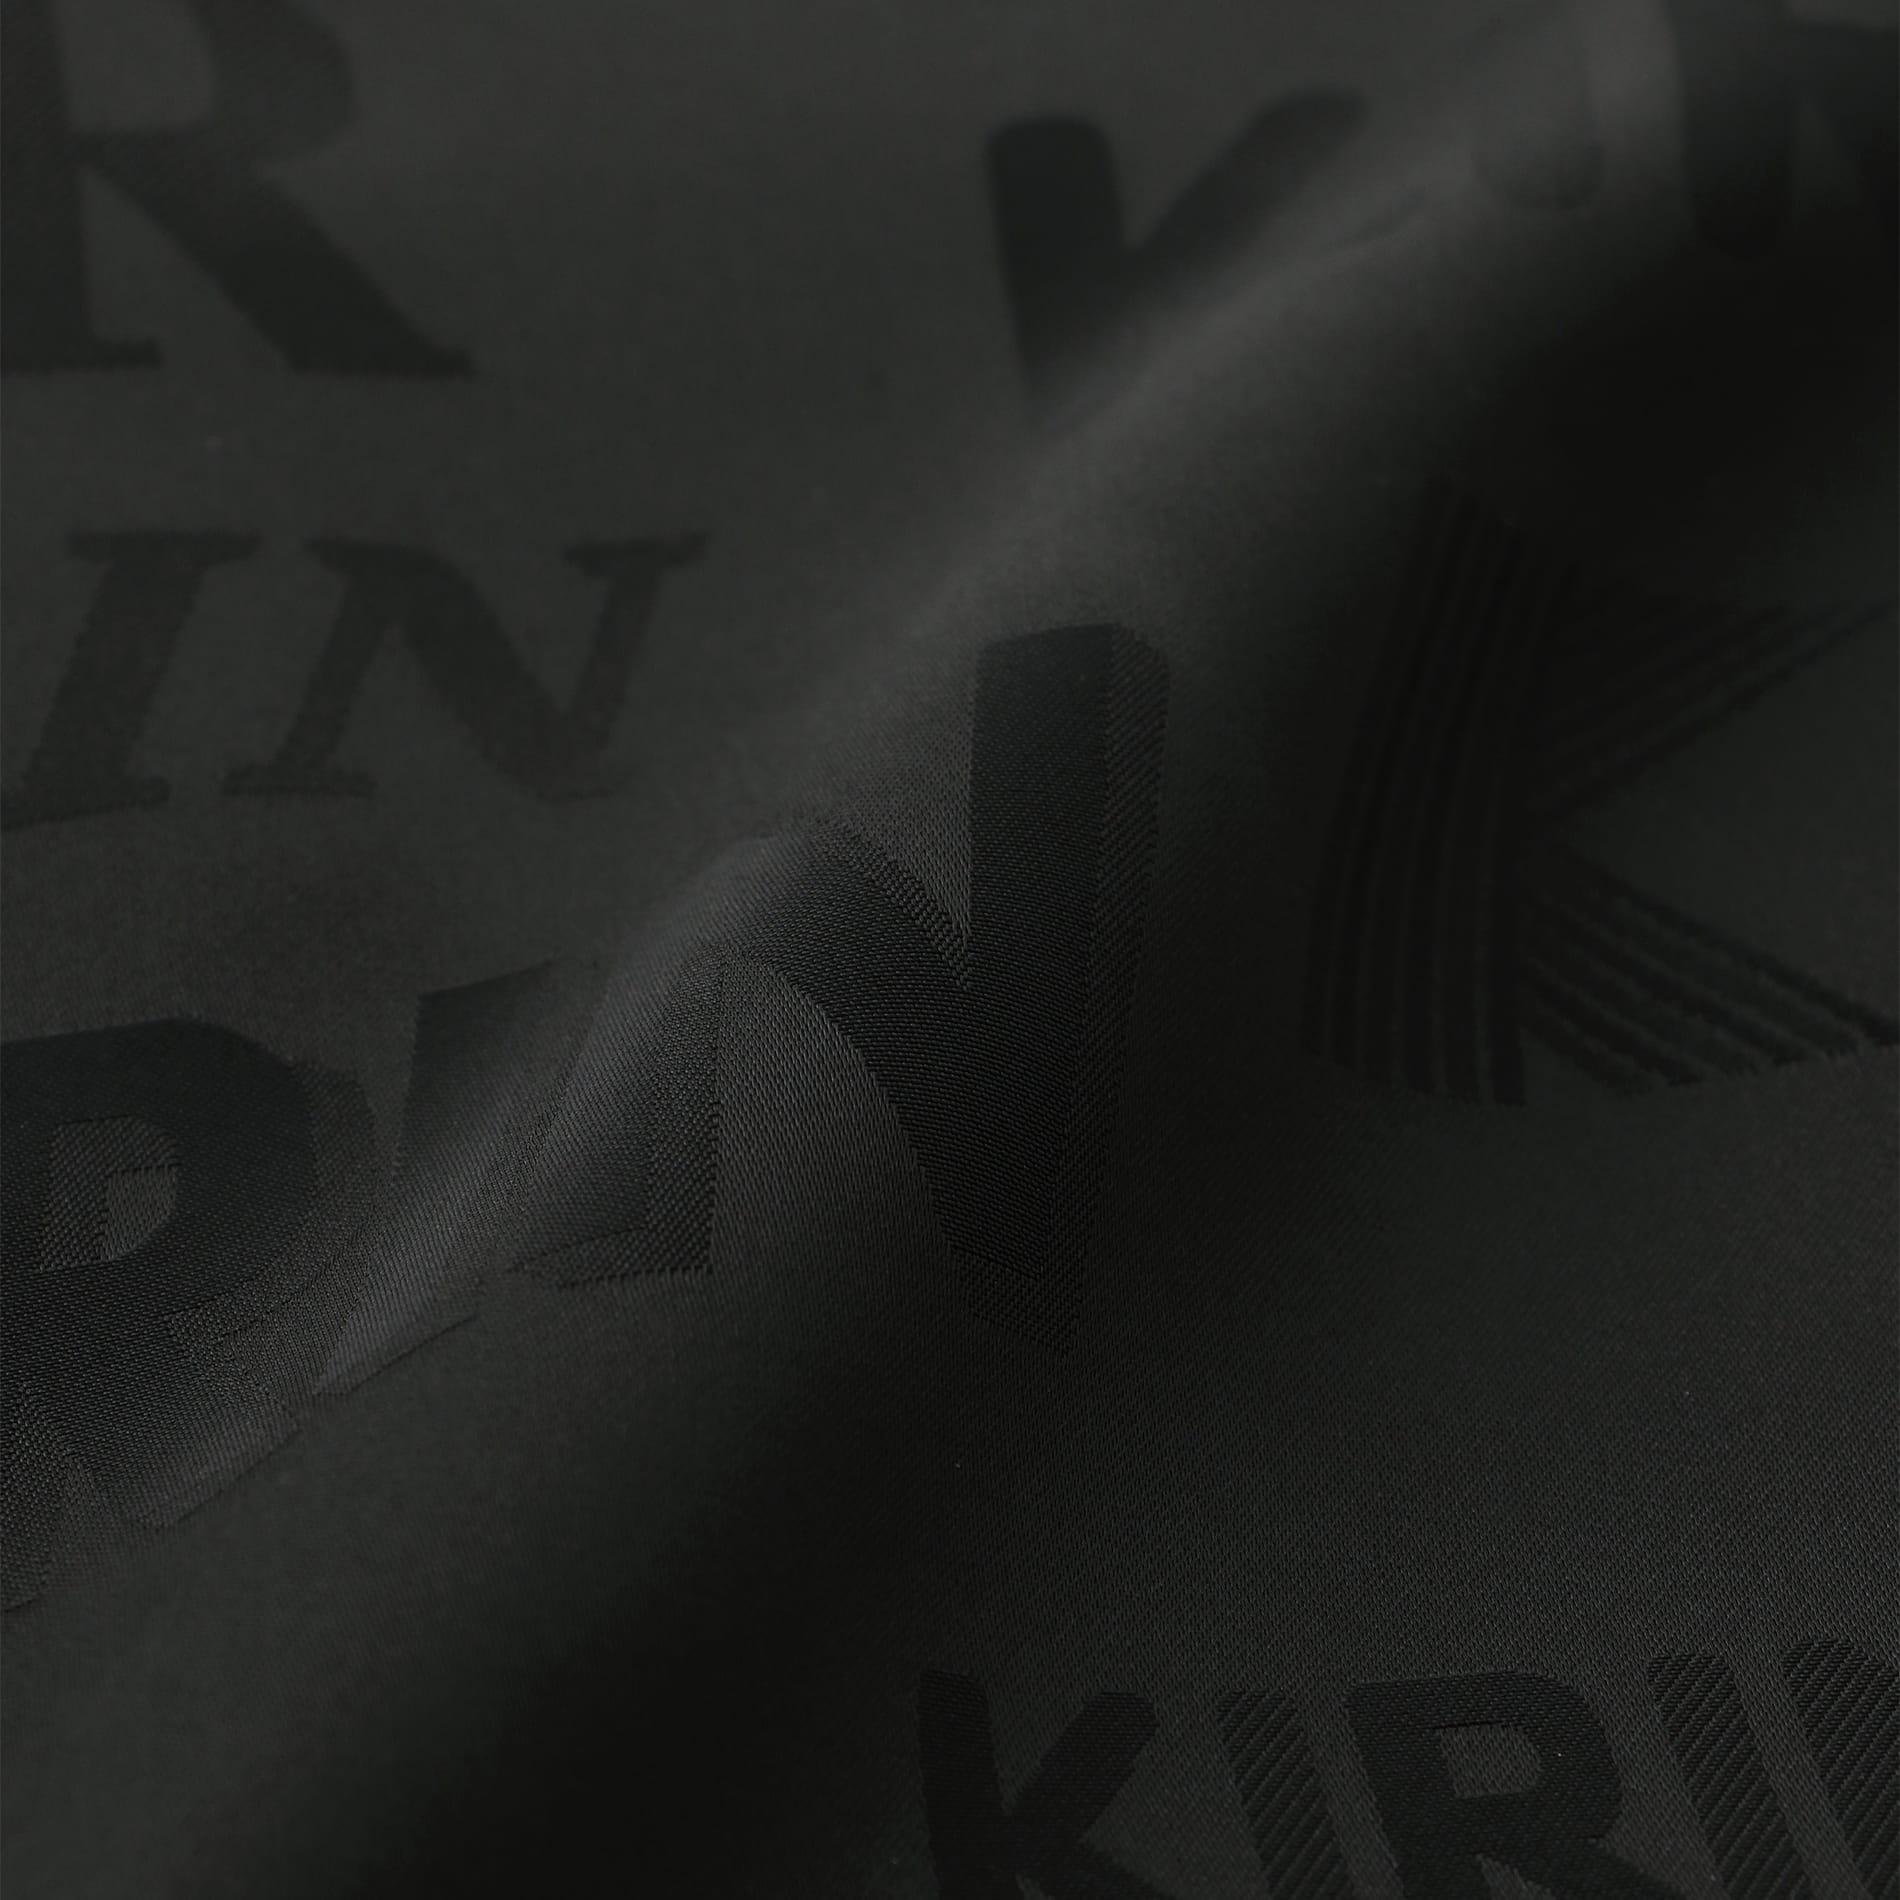 【KIRIN】WOMEN ショーツ JCQD TYPO FLUID SHT